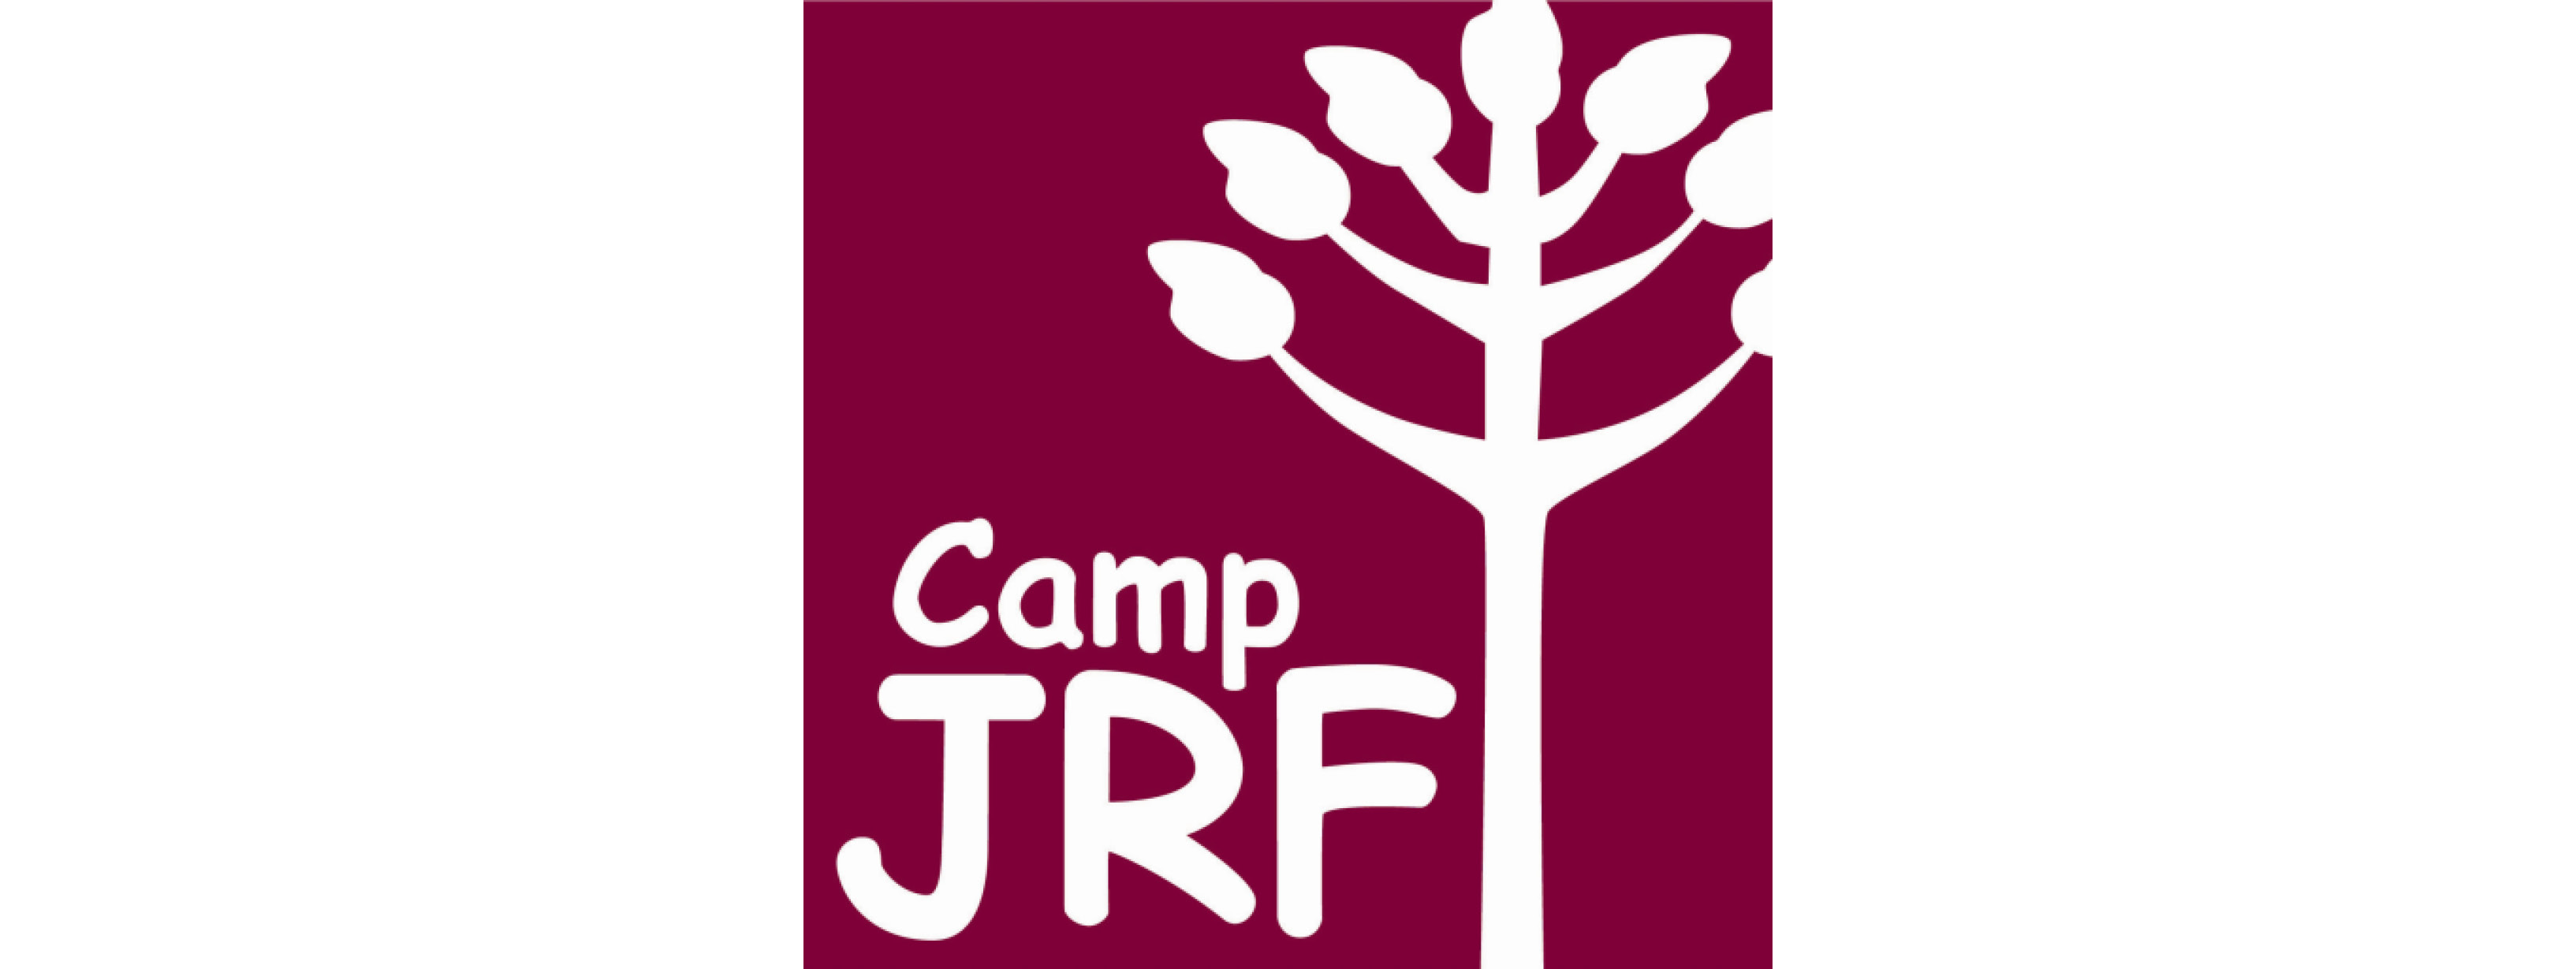 CAMP JRF